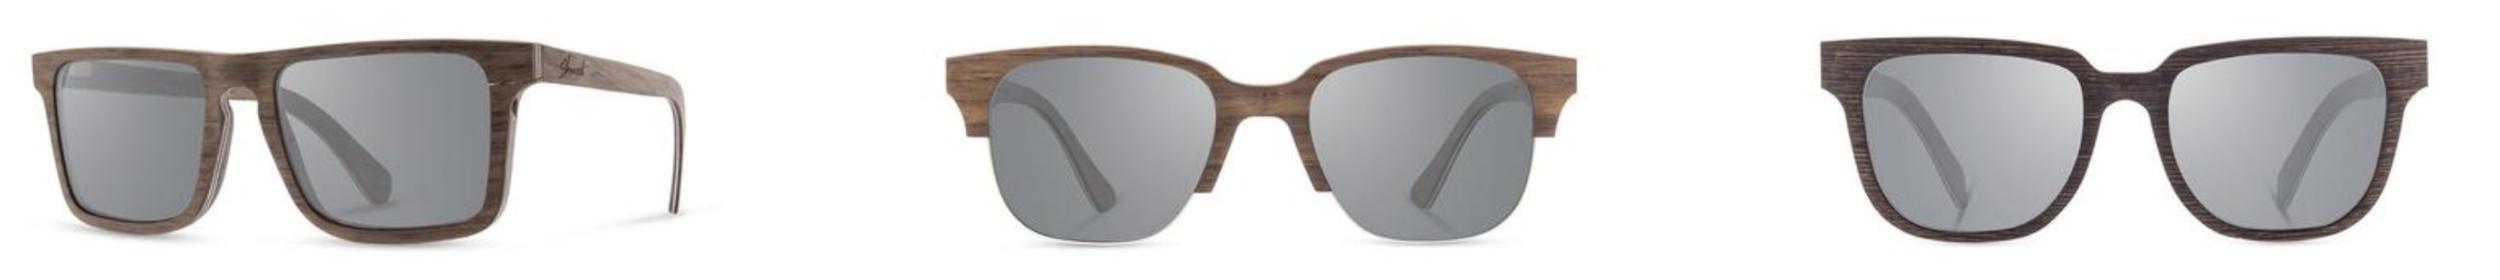 Shwood Eyewear